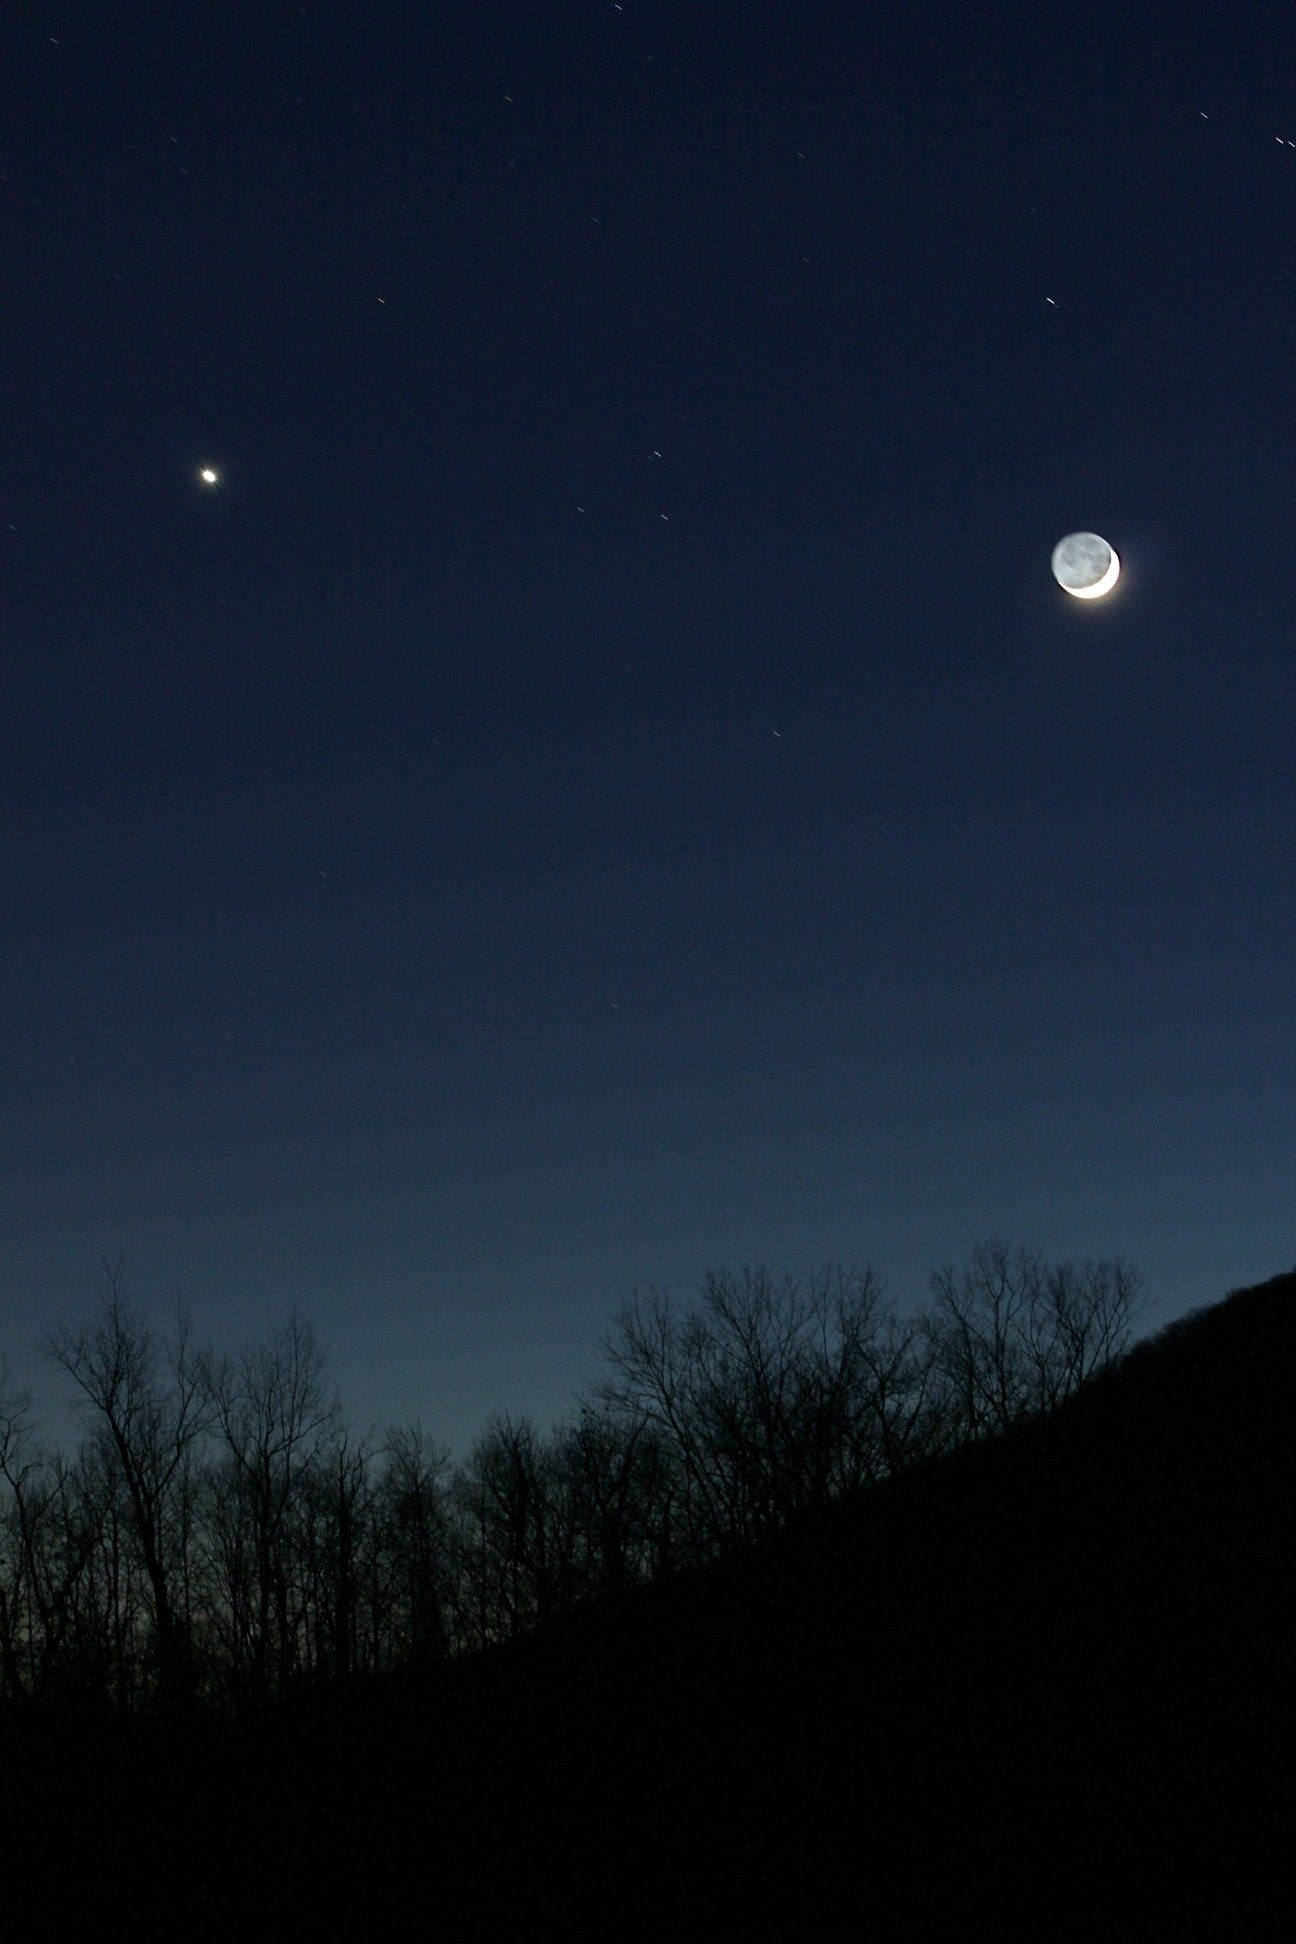 Bright Venus & Moon Thrill Skywatchers